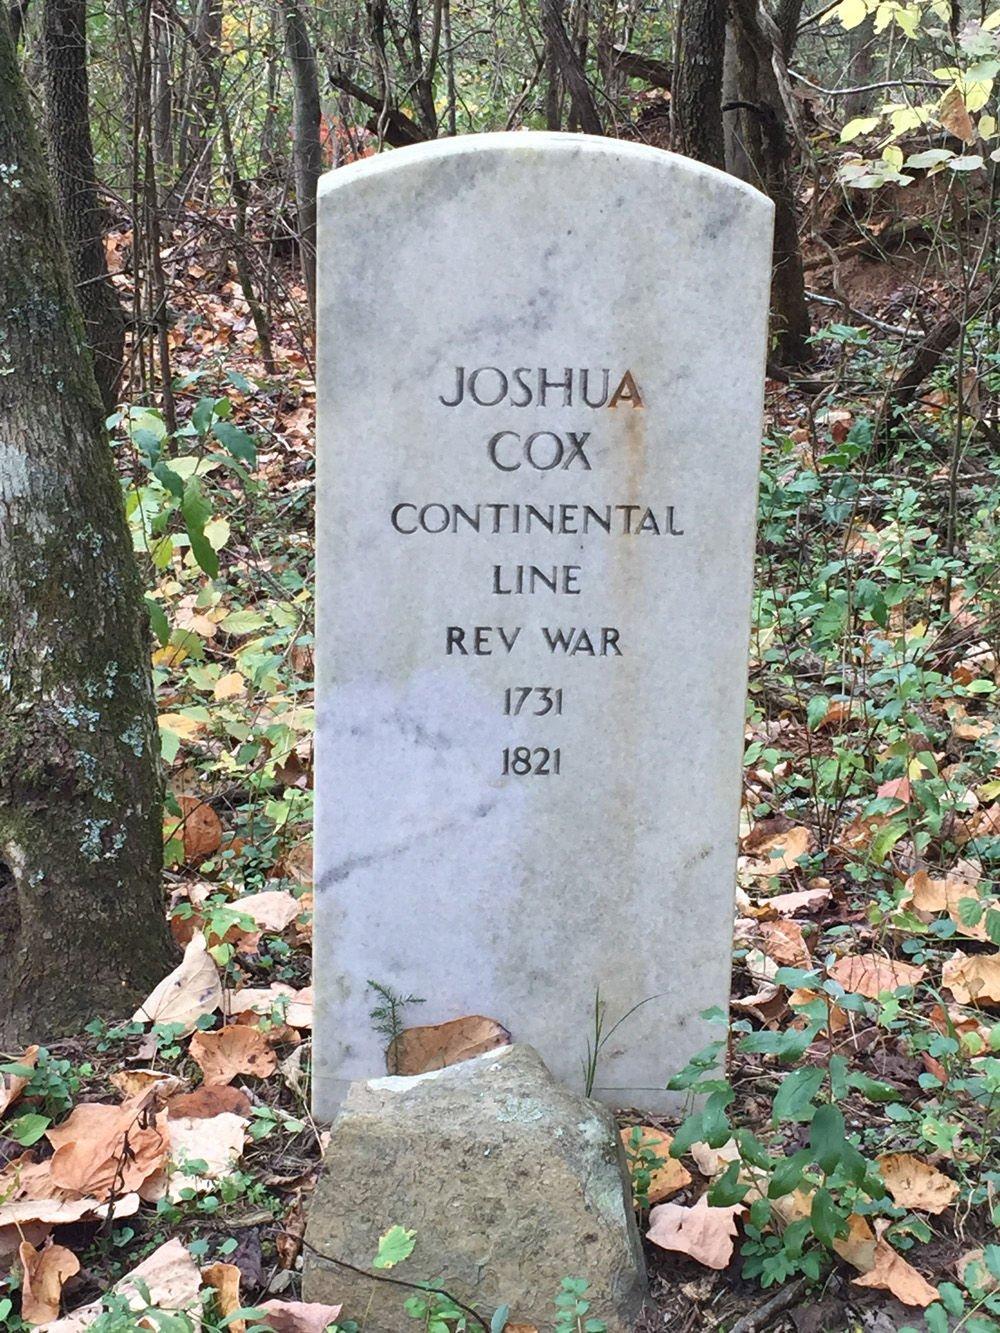 Joshua Cox